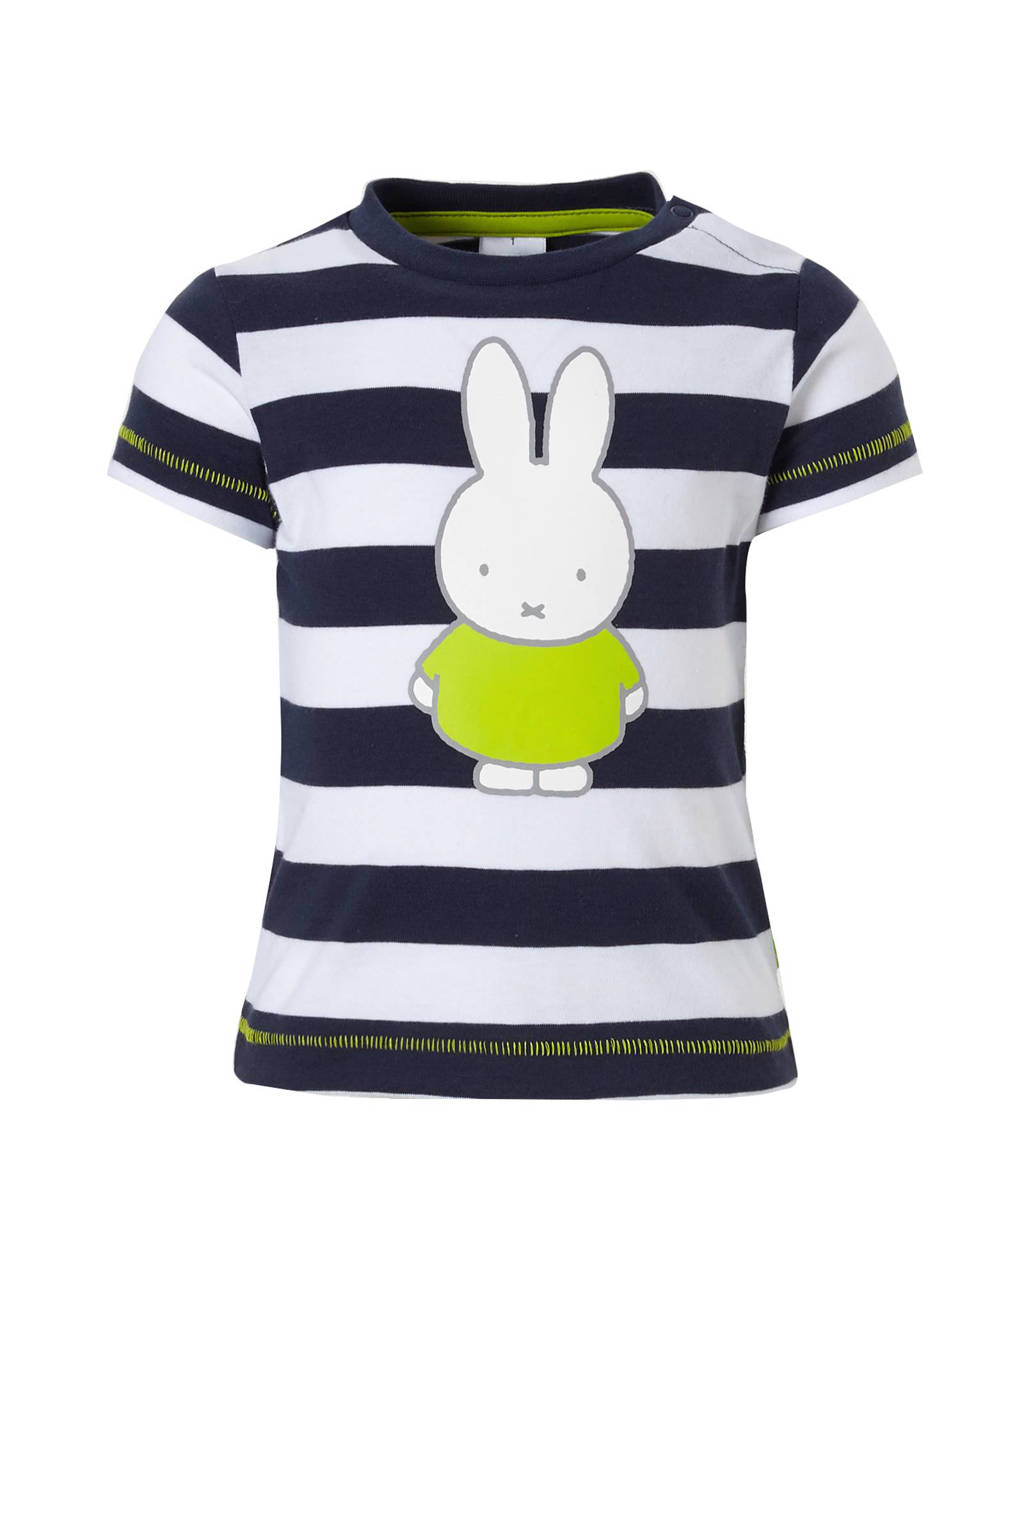 C&A nijntje strepen T-shirt, Donkerblauw/wit/limegroen